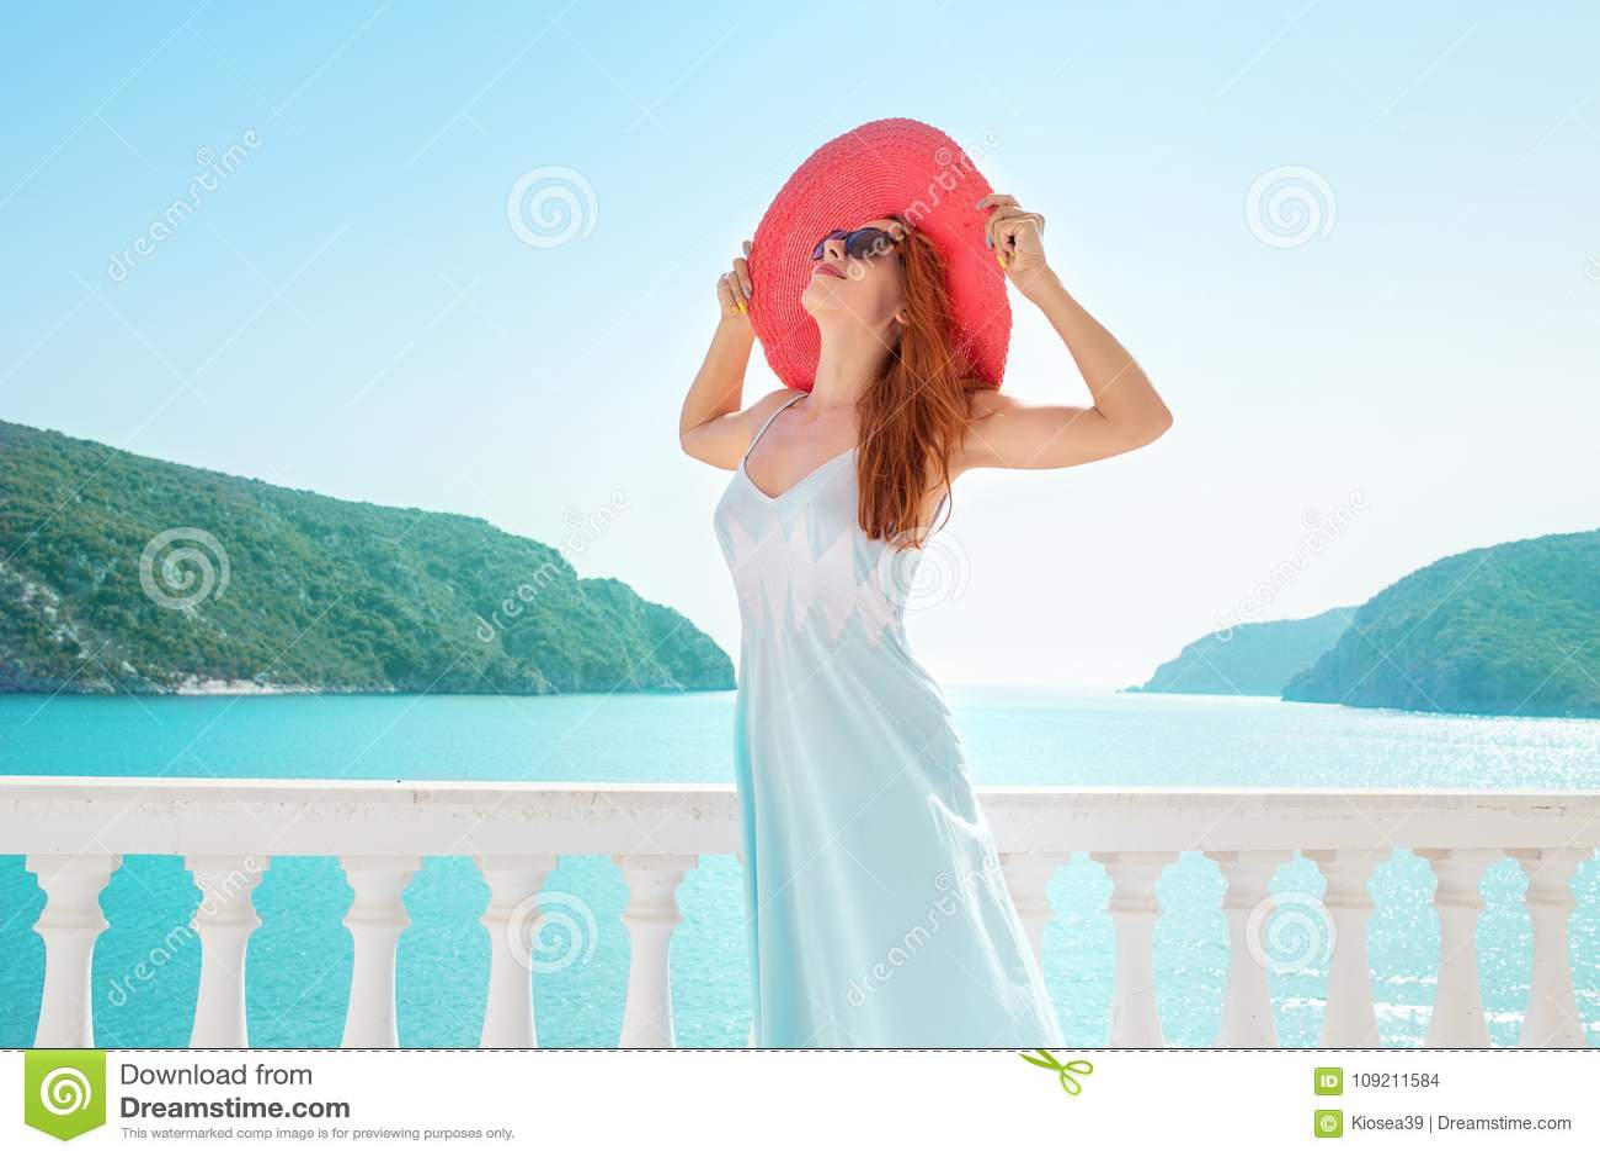 Content woman enjoying luxurious resort